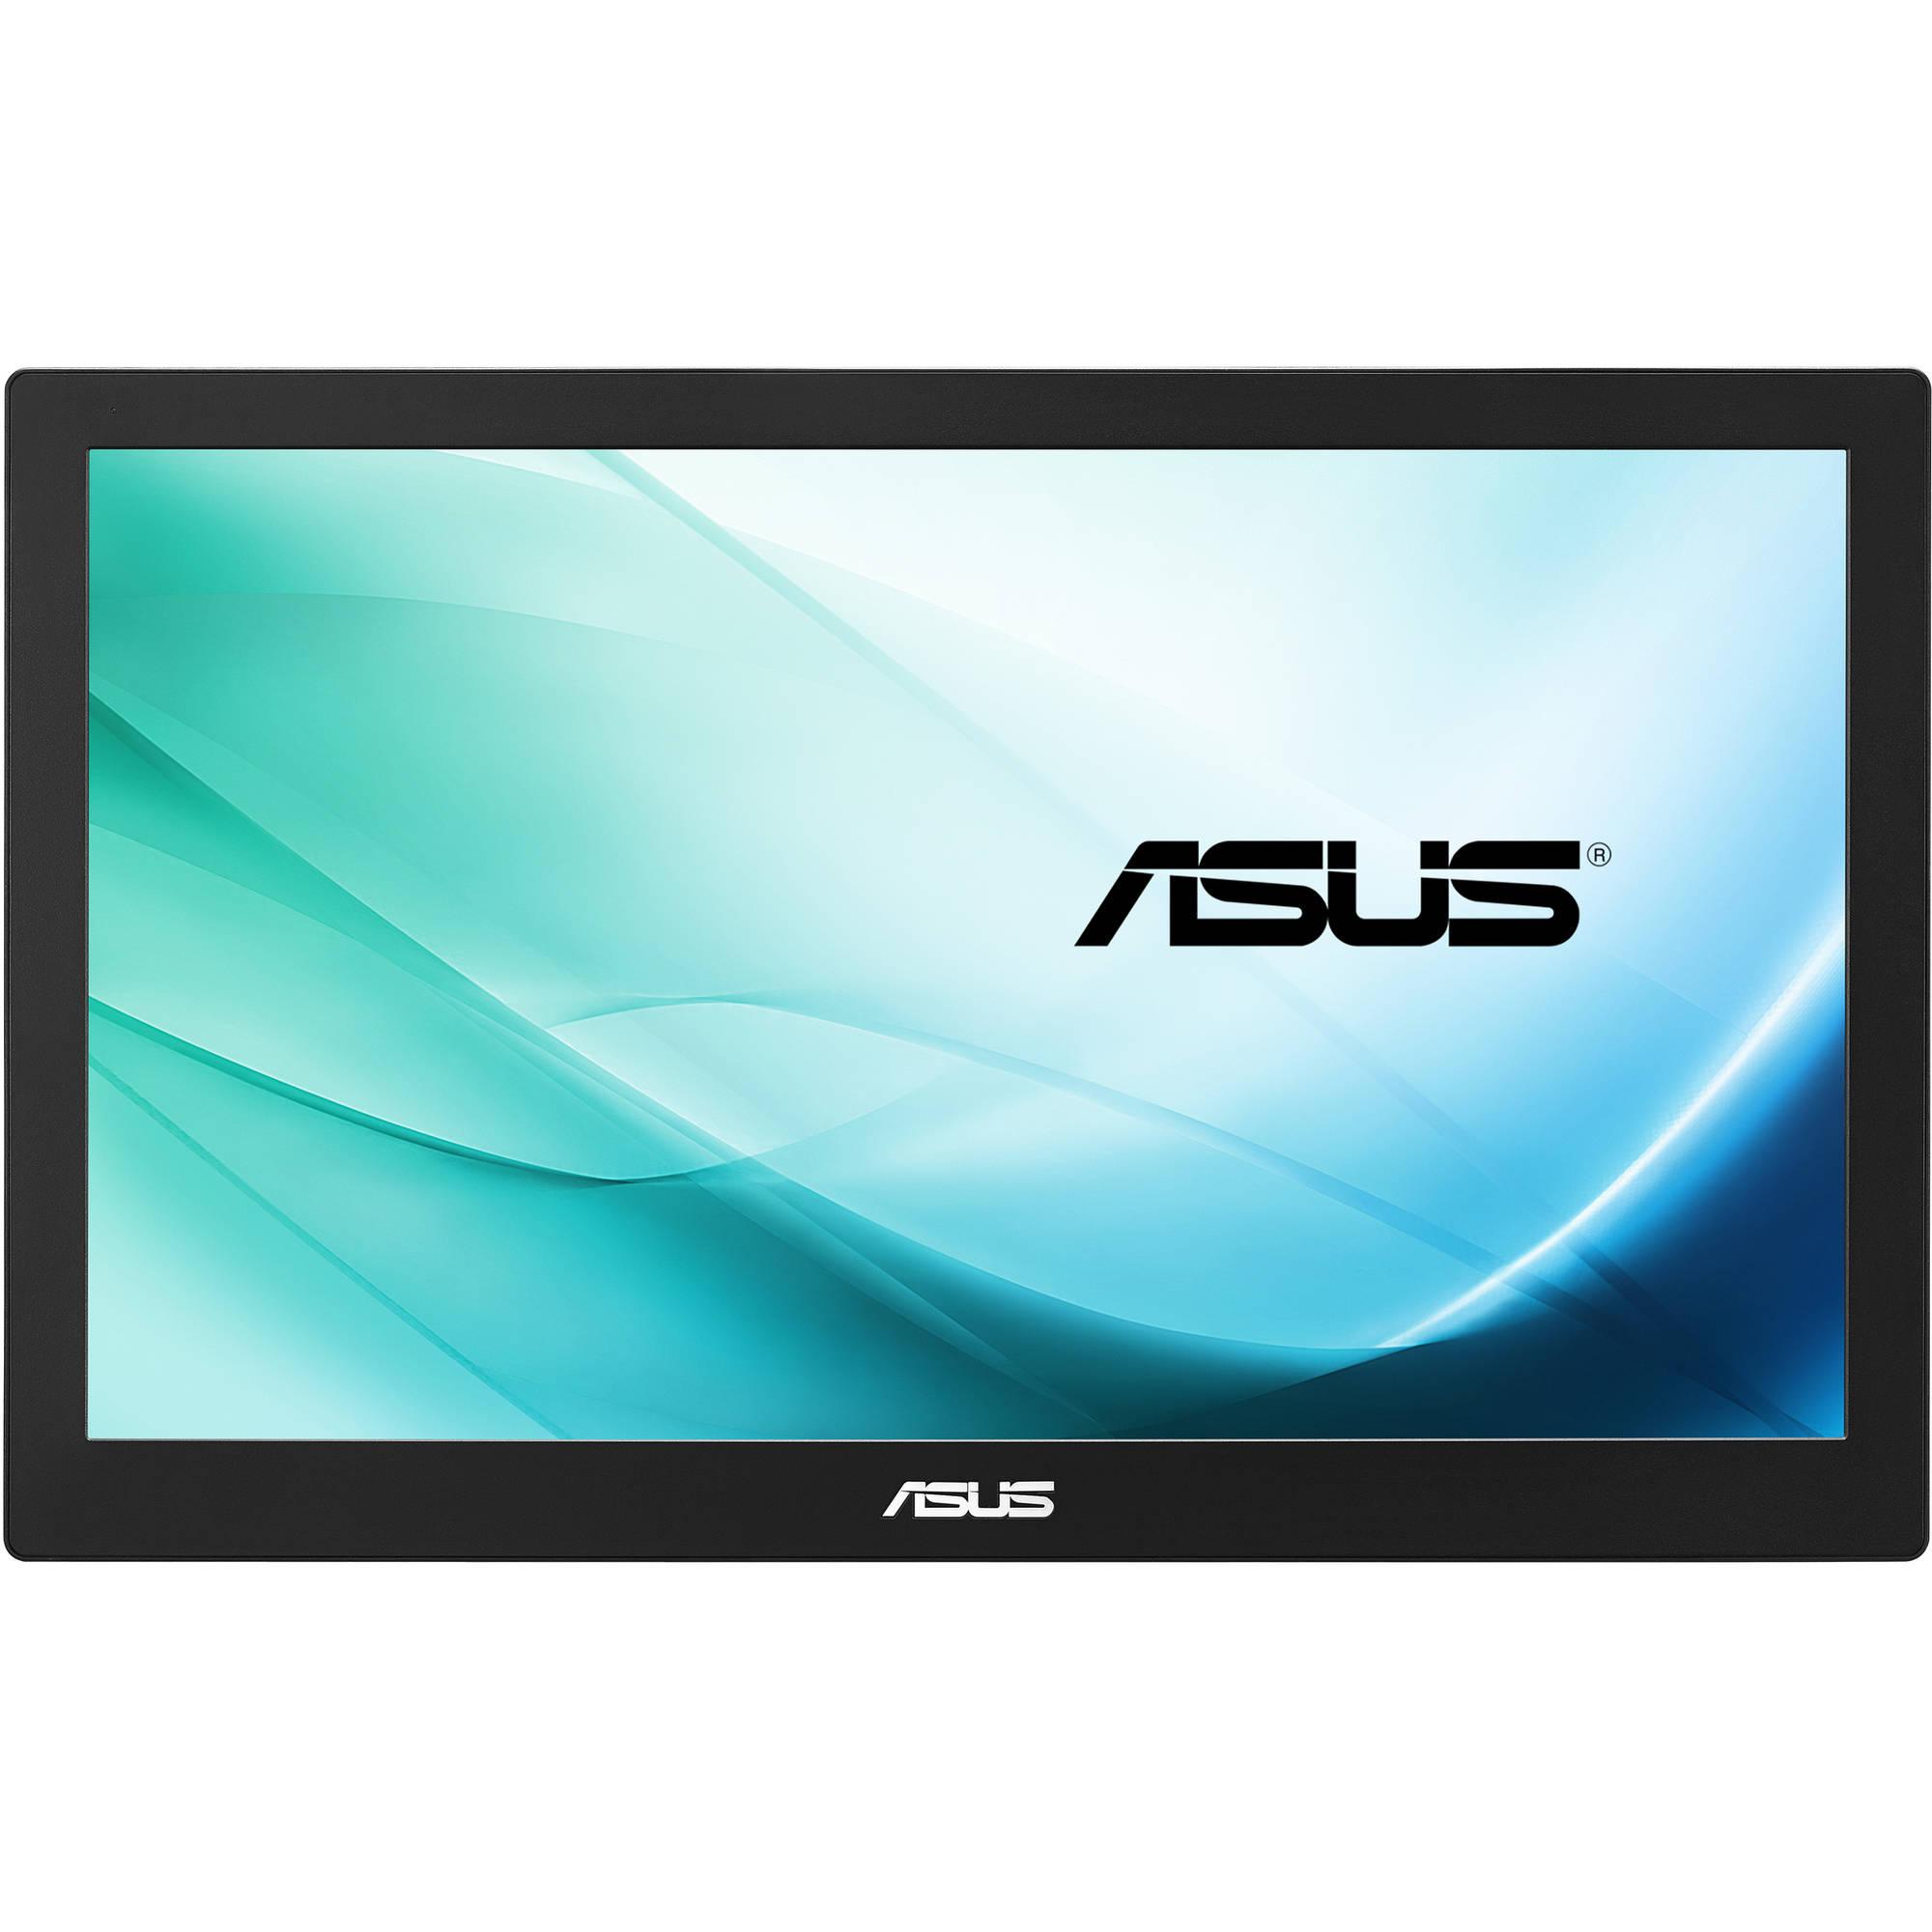 "Fotografie Monitor portabil LED IPS ASUS 15.6"", Wide, Full HD, alimentare USB 3.0, Negru, MB169B+"